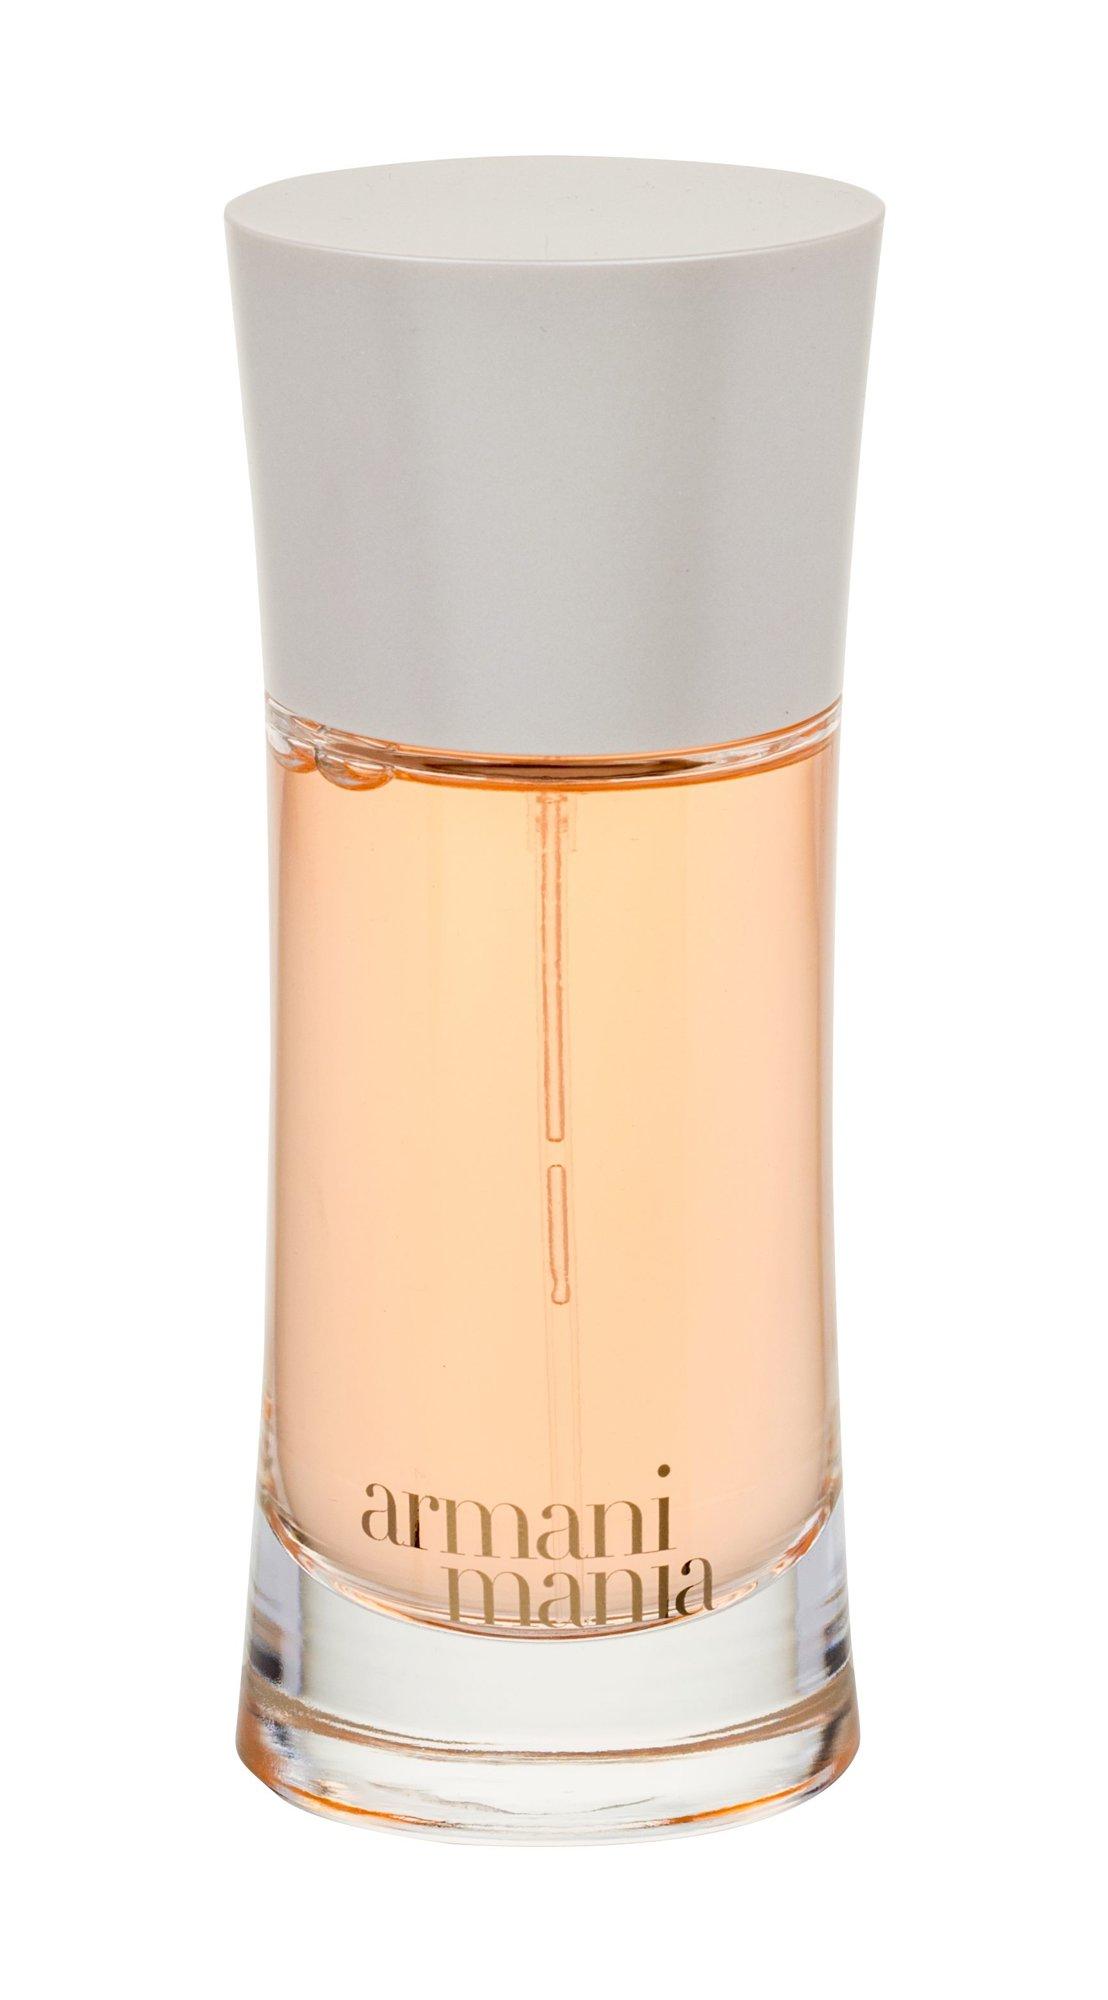 Giorgio Armani Armani Mania Pour Femme Eau de Parfum 50ml